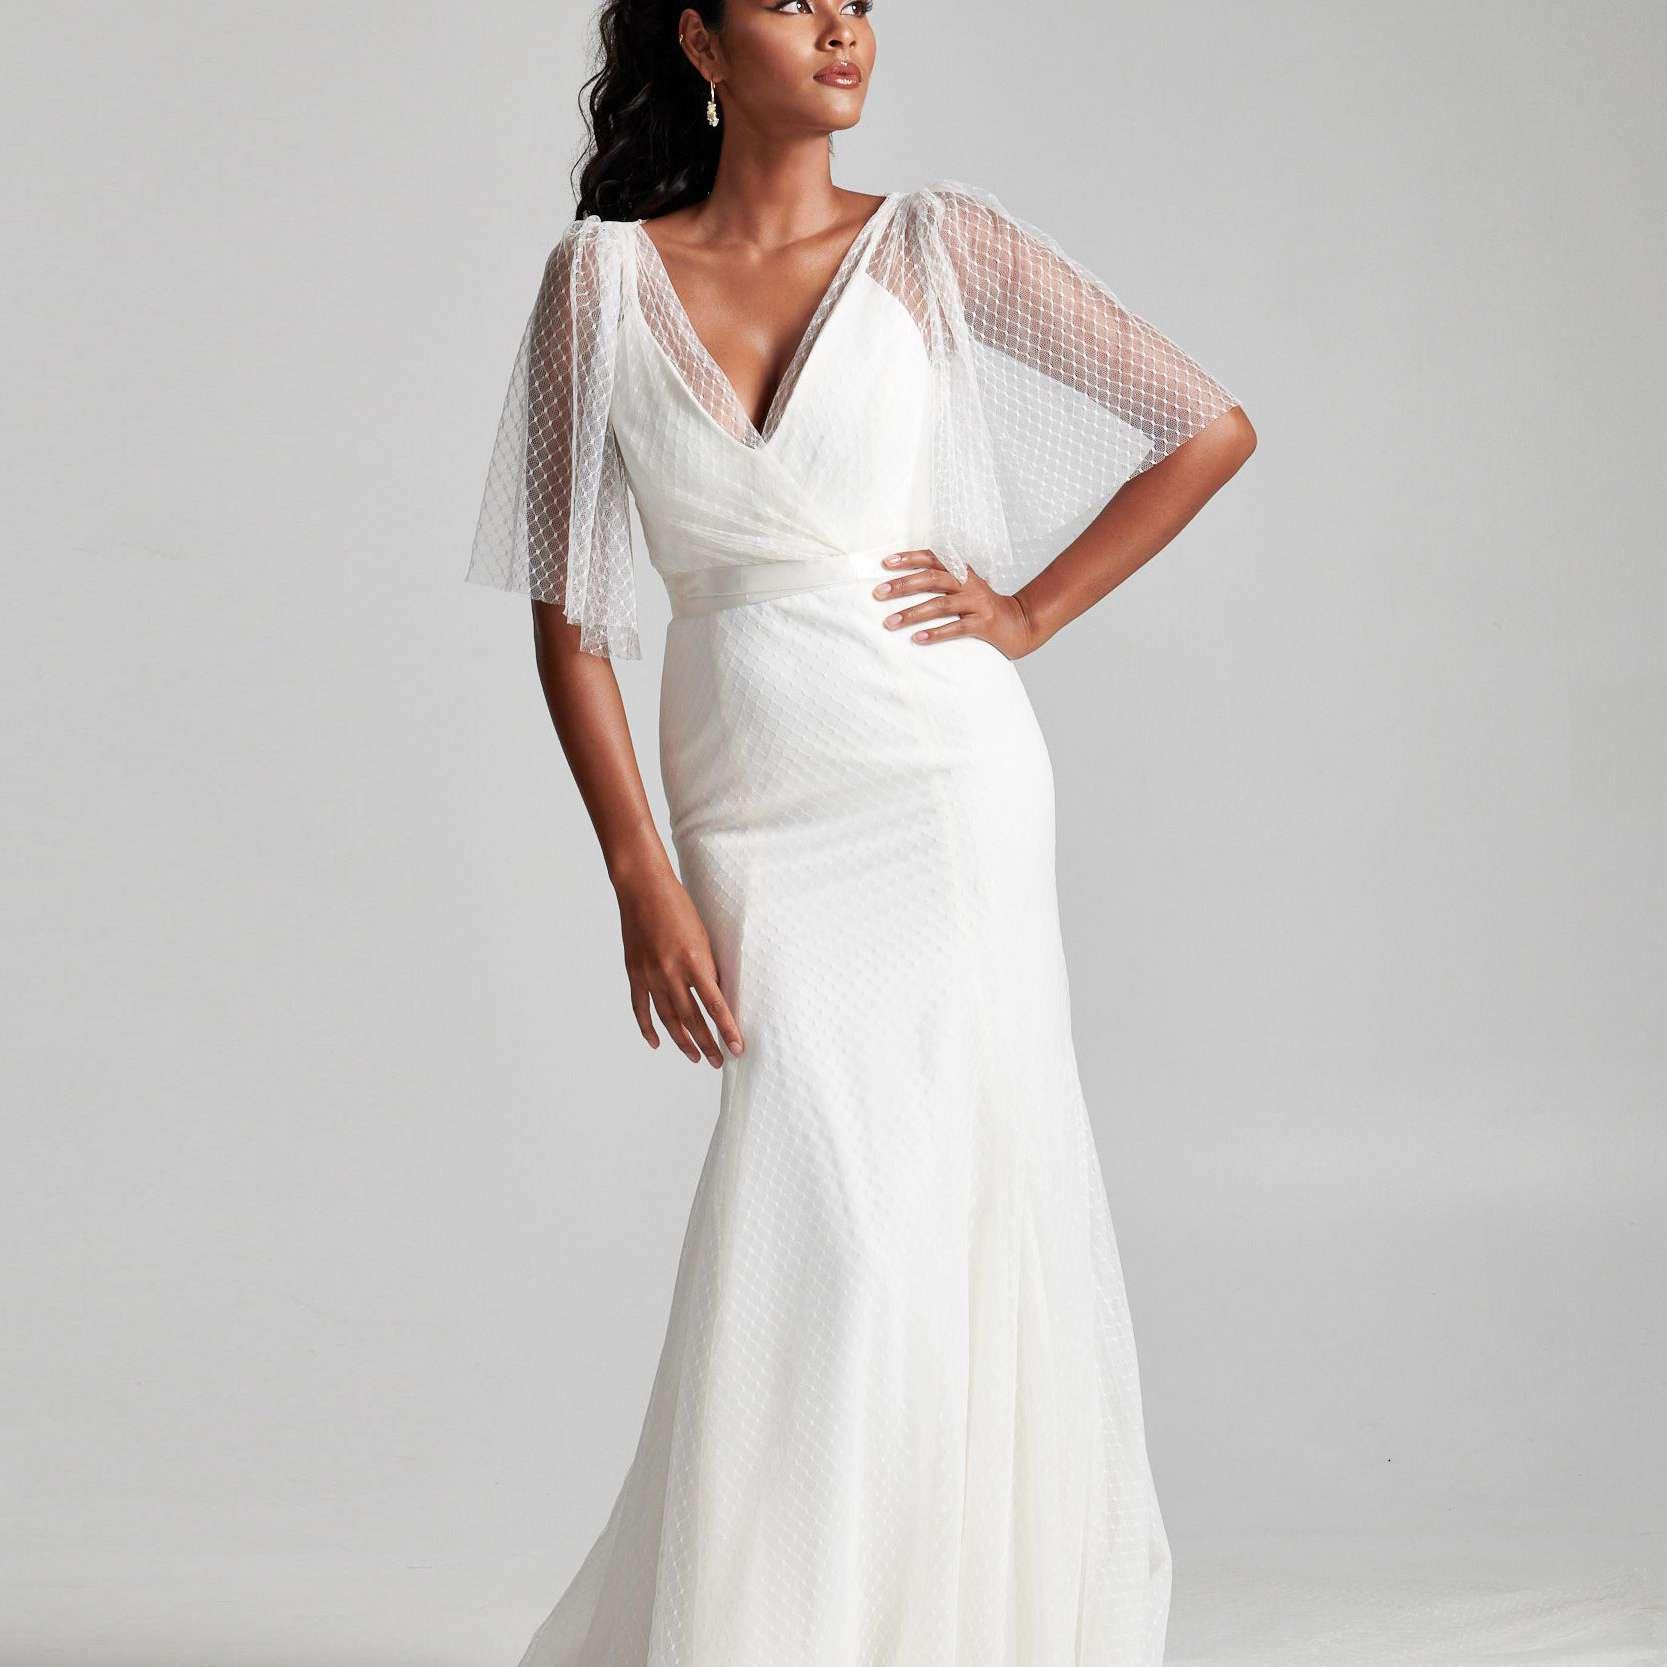 Model in V-neck wedding dress with sheer topper